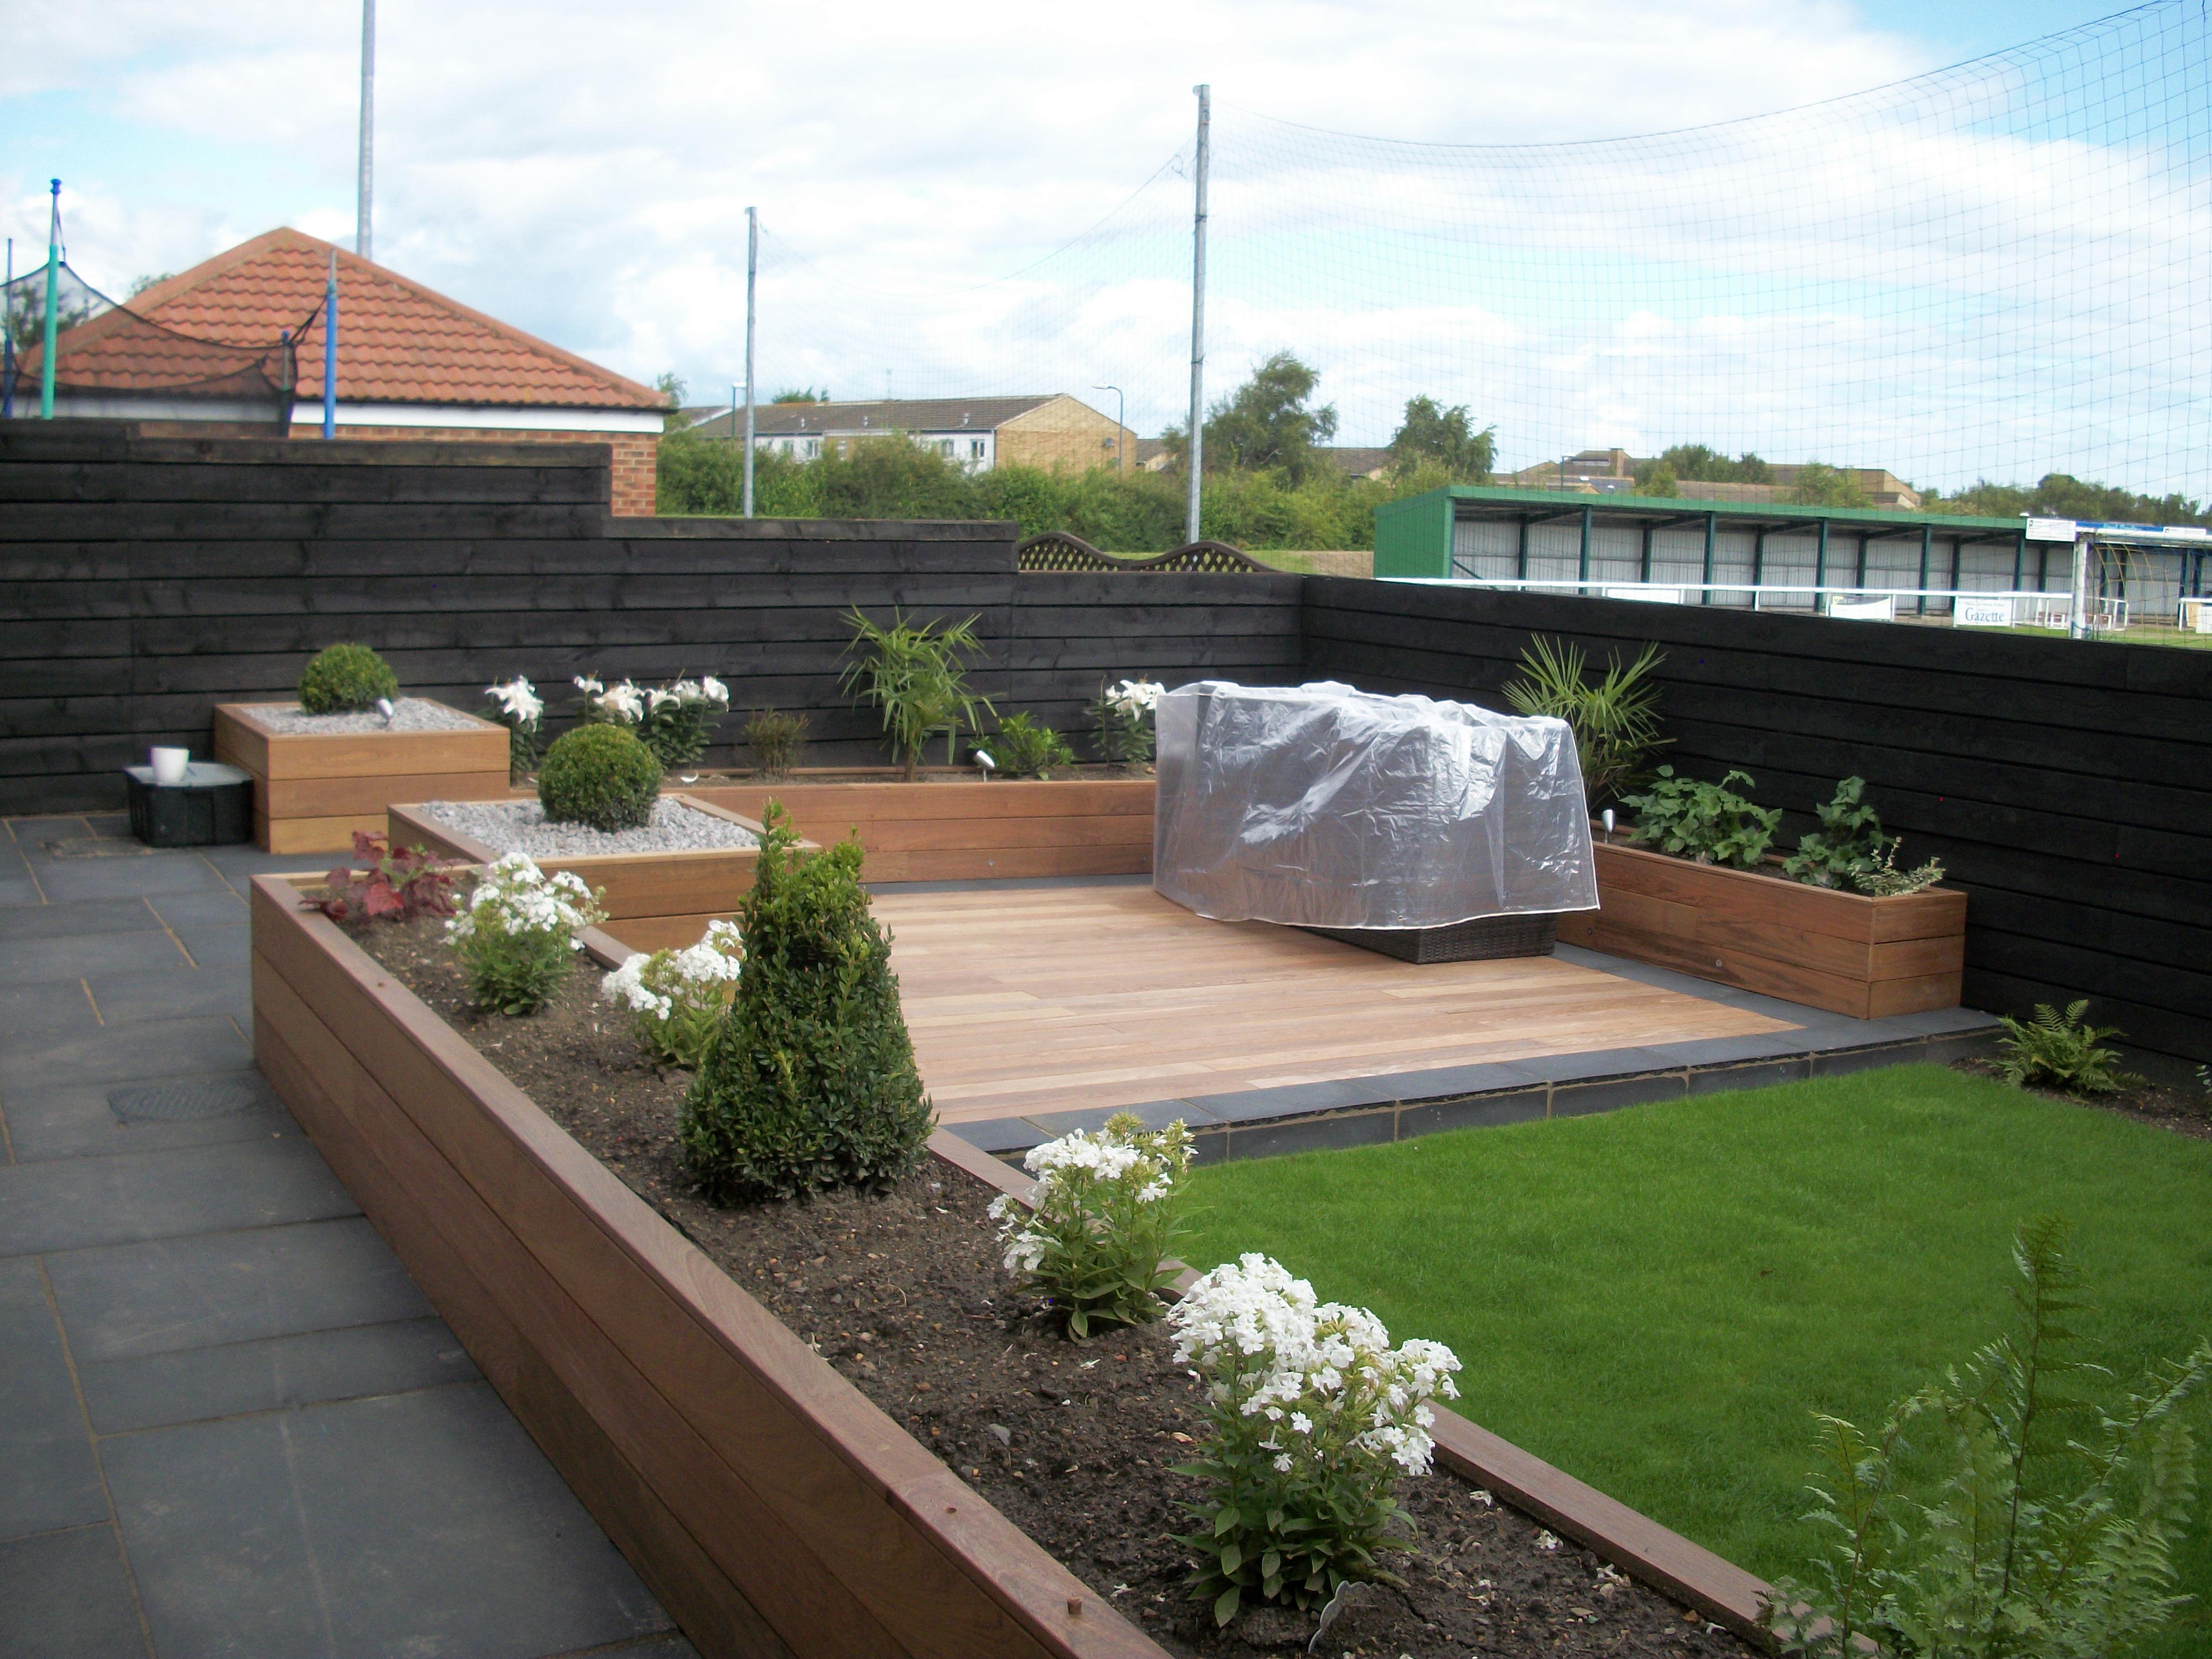 Garden Designer | Newcastle upon Tyne | New Build Gardens